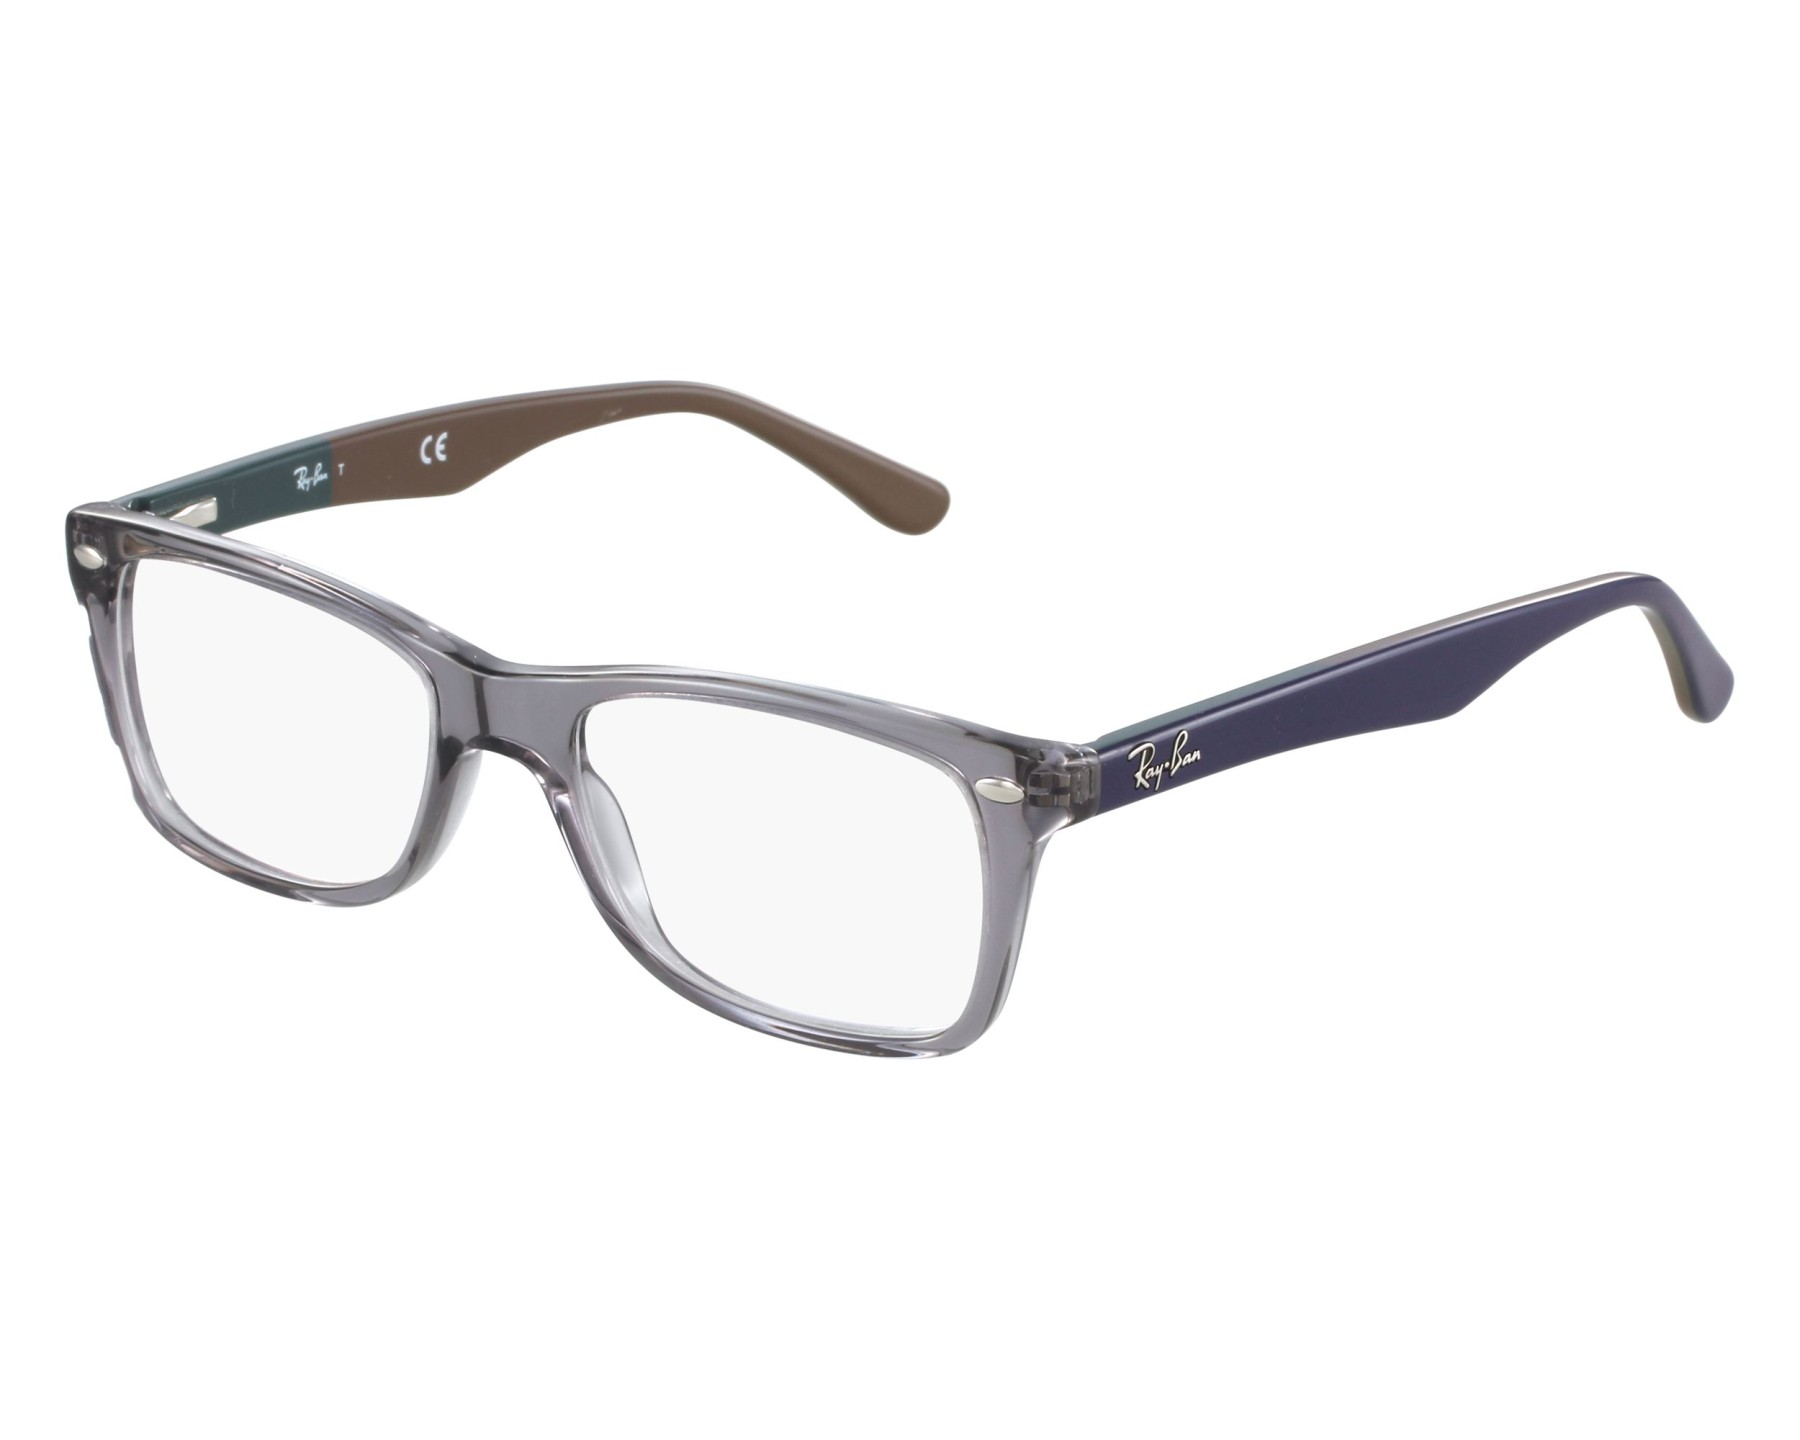 284549e6e Brillen Ray-Ban RX-5228 5546 53-17 grau blau Vorderansicht